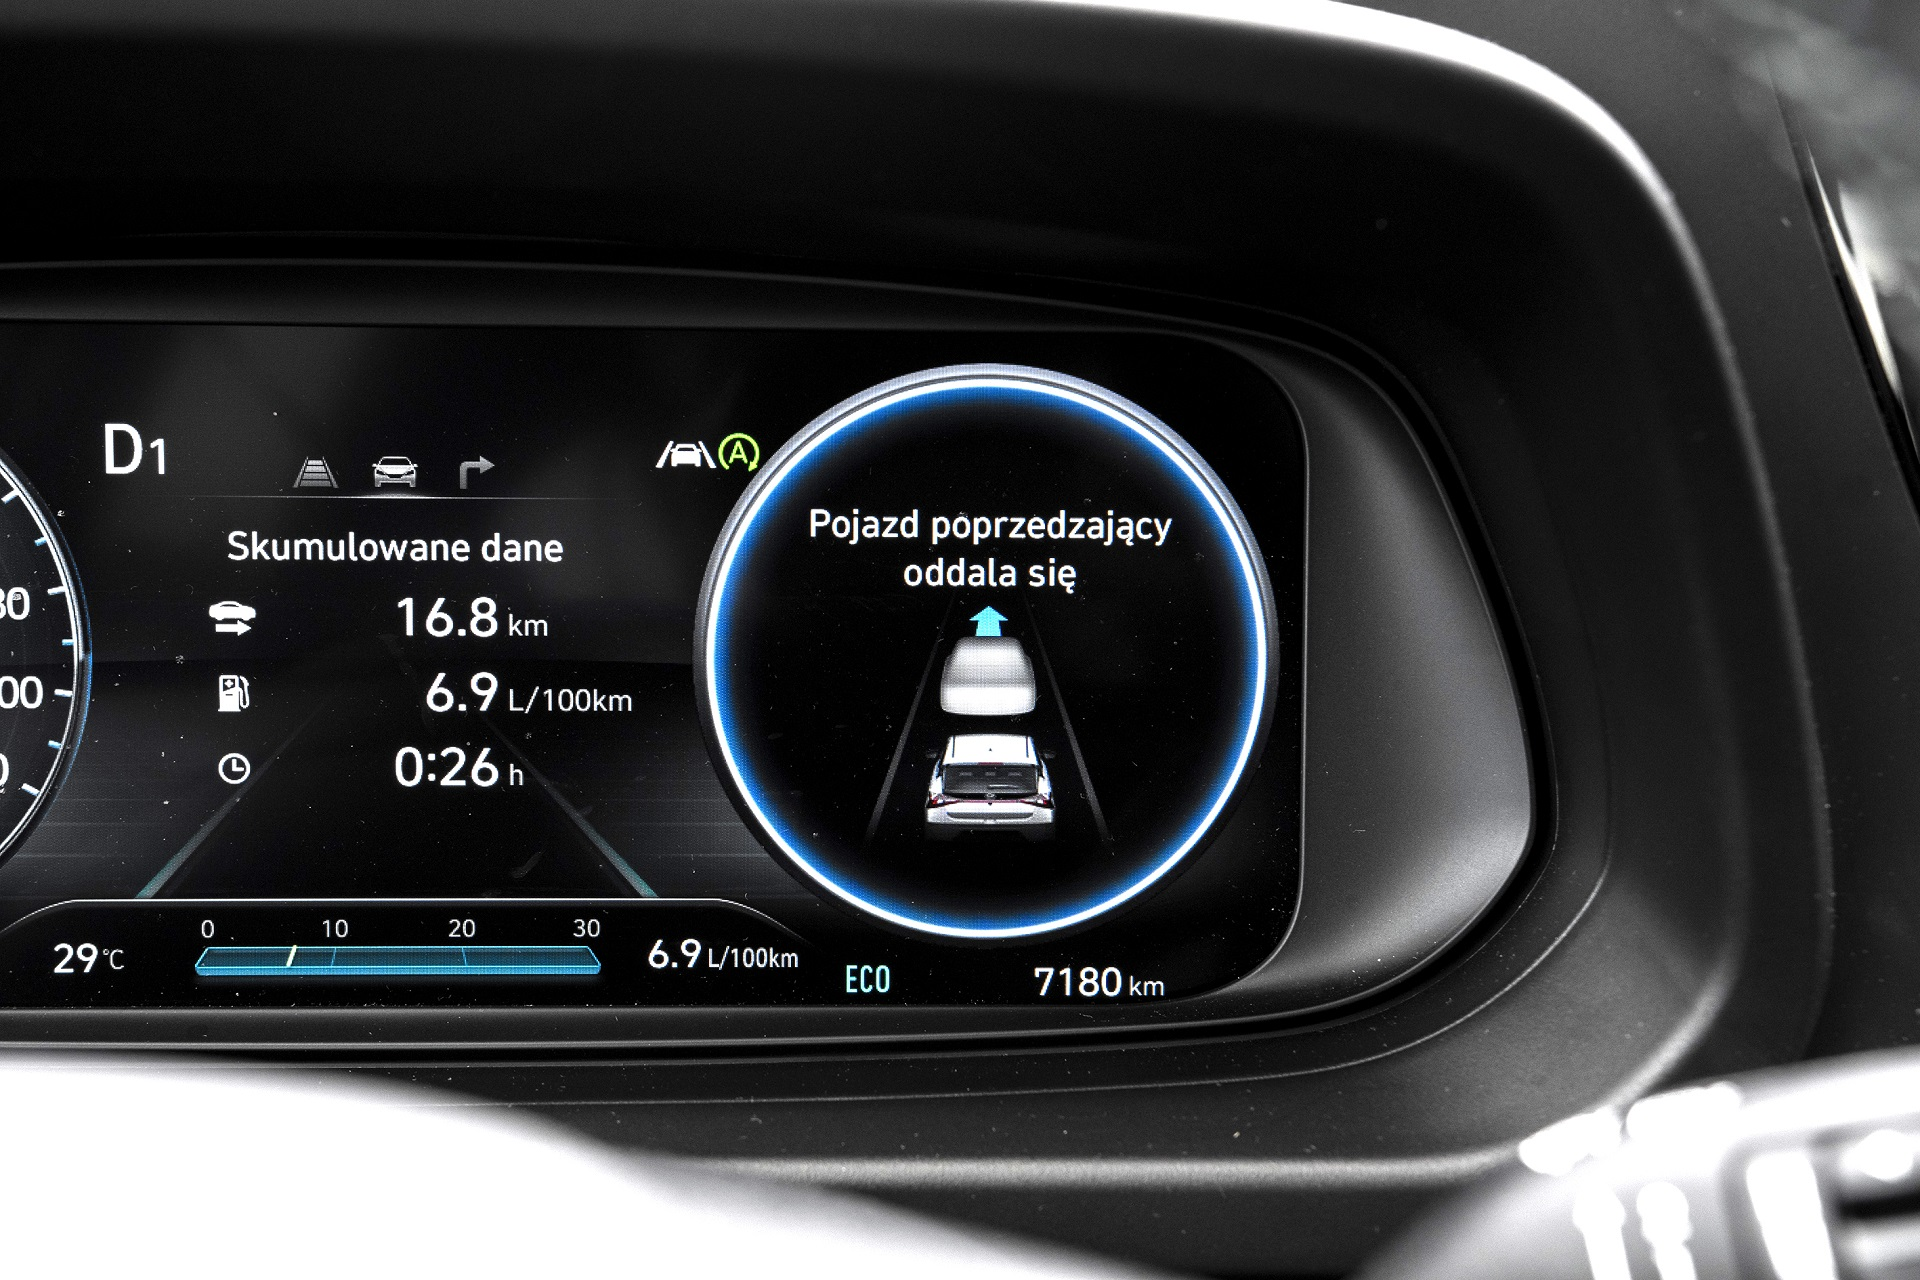 2021 Hyundai Bayon - zegary